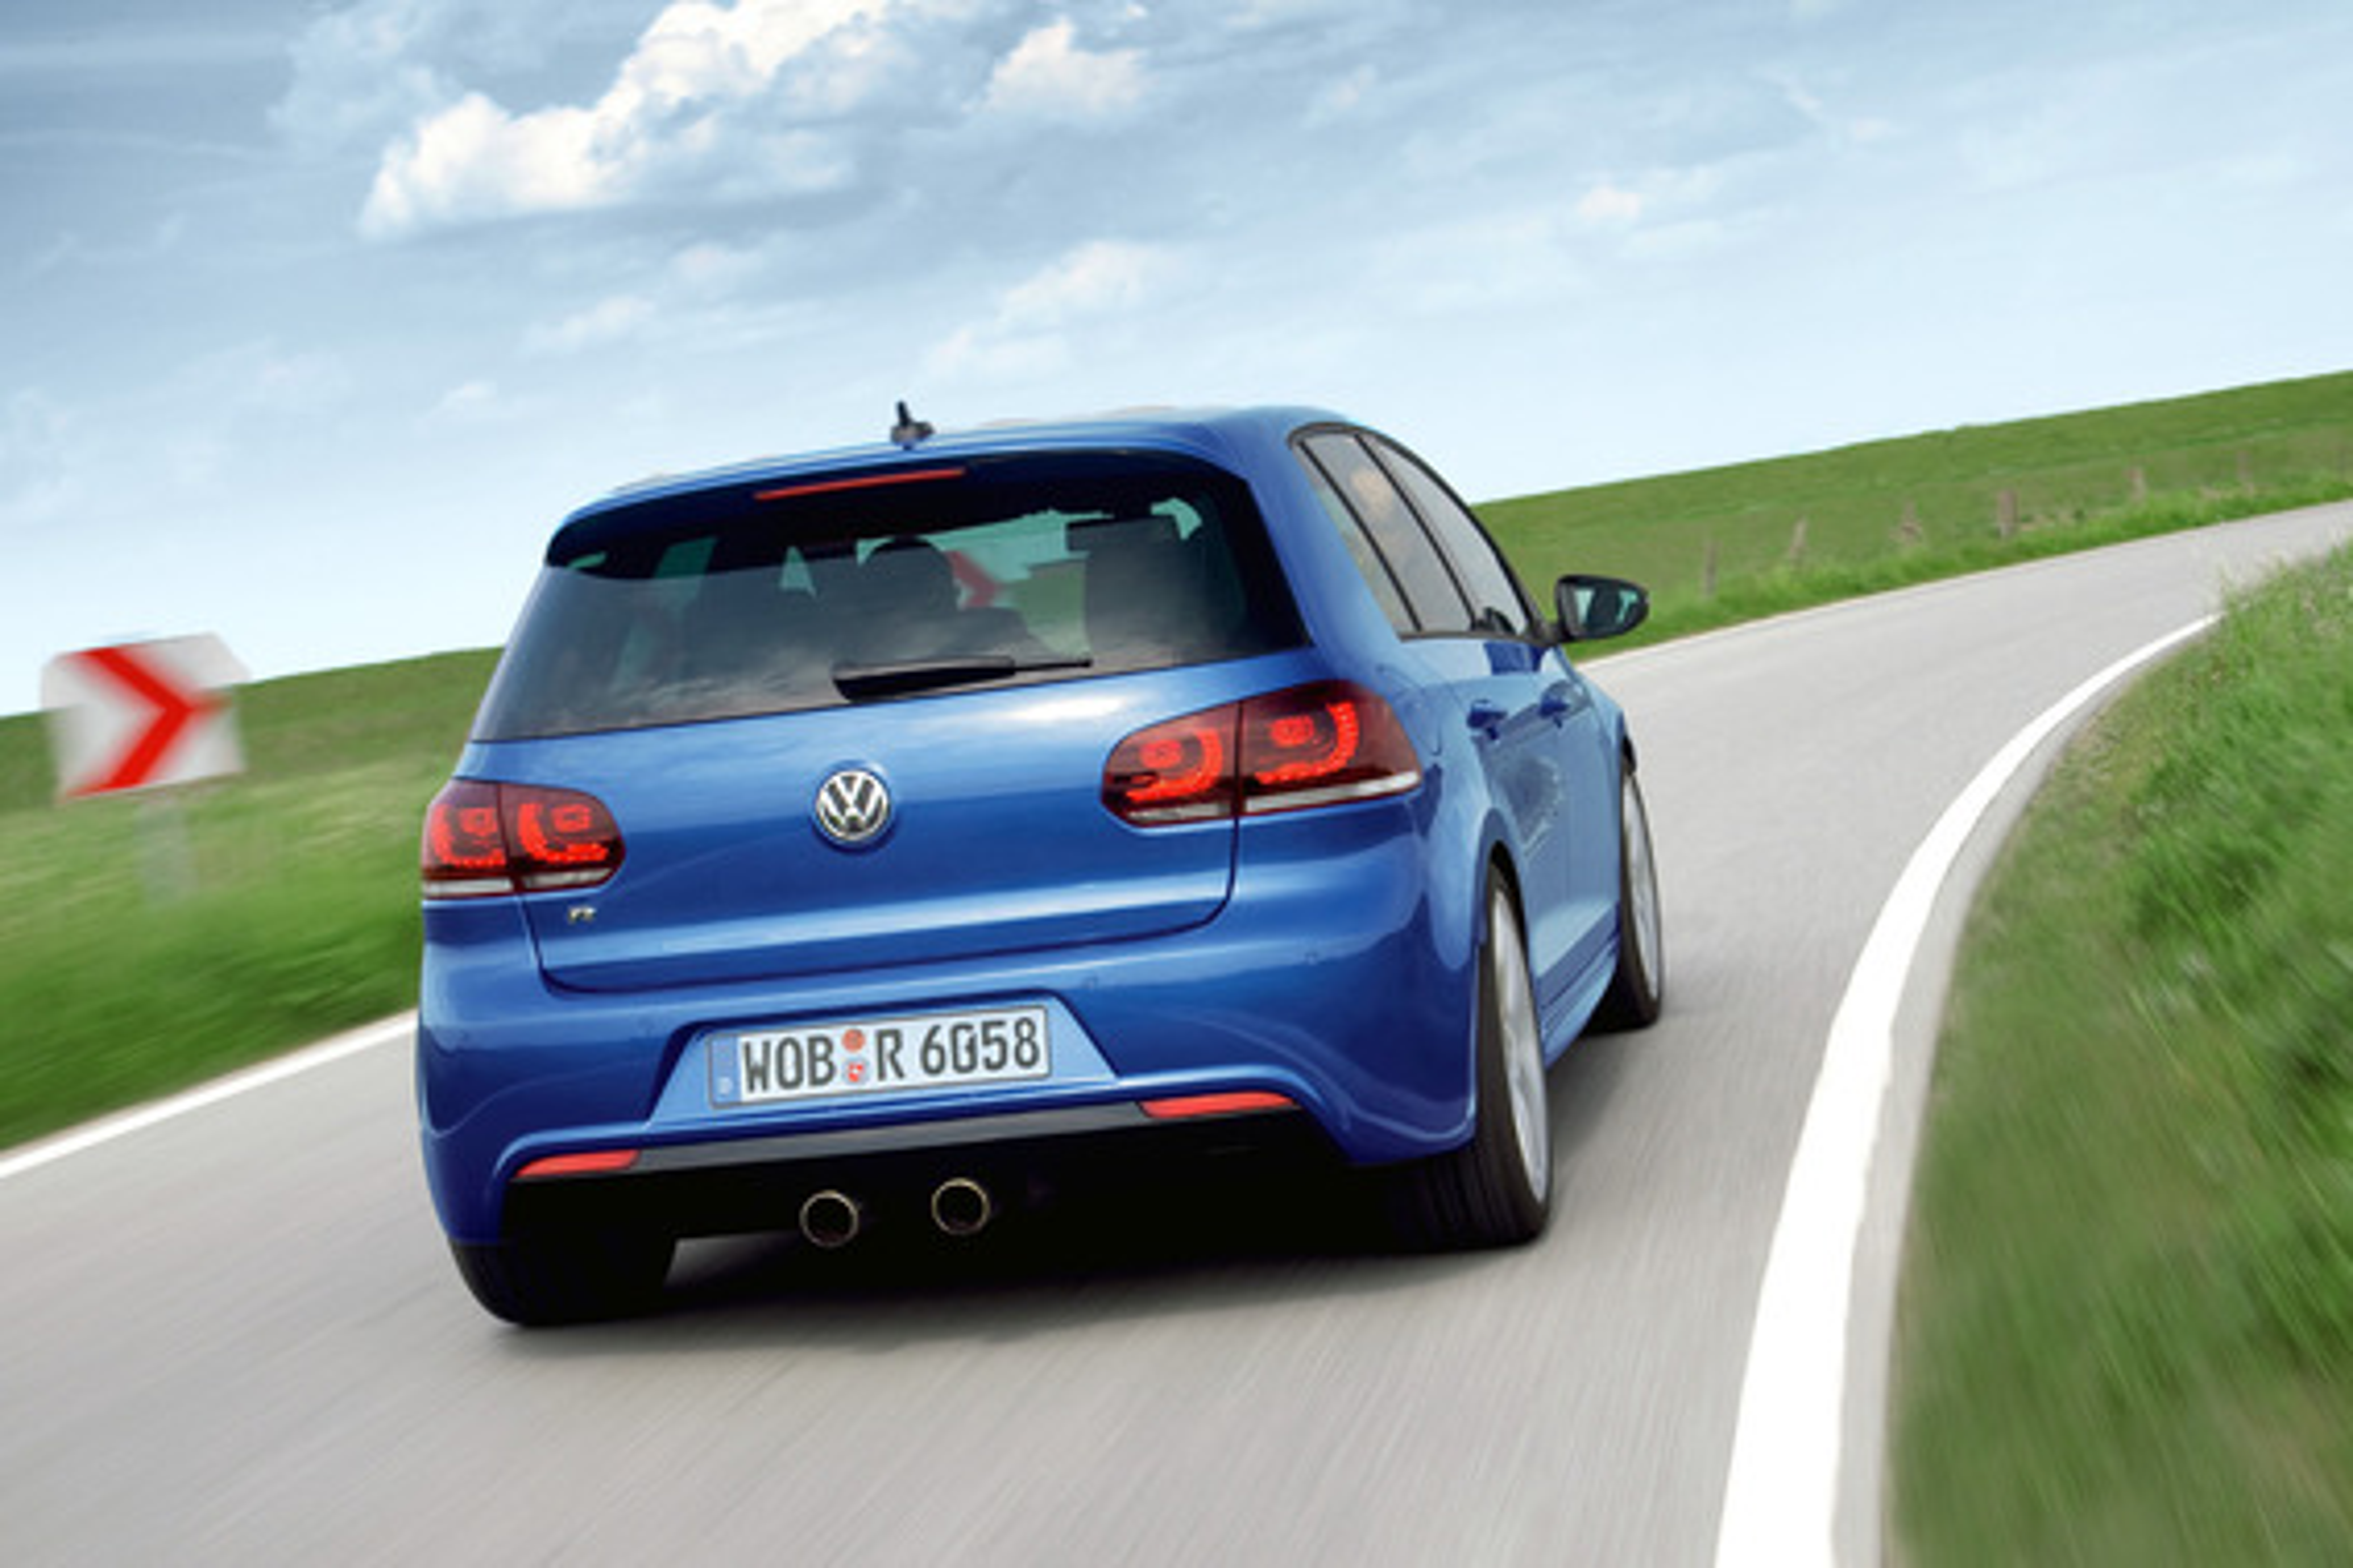 При движении задним ходом включается задний дворник на VW Golf VI